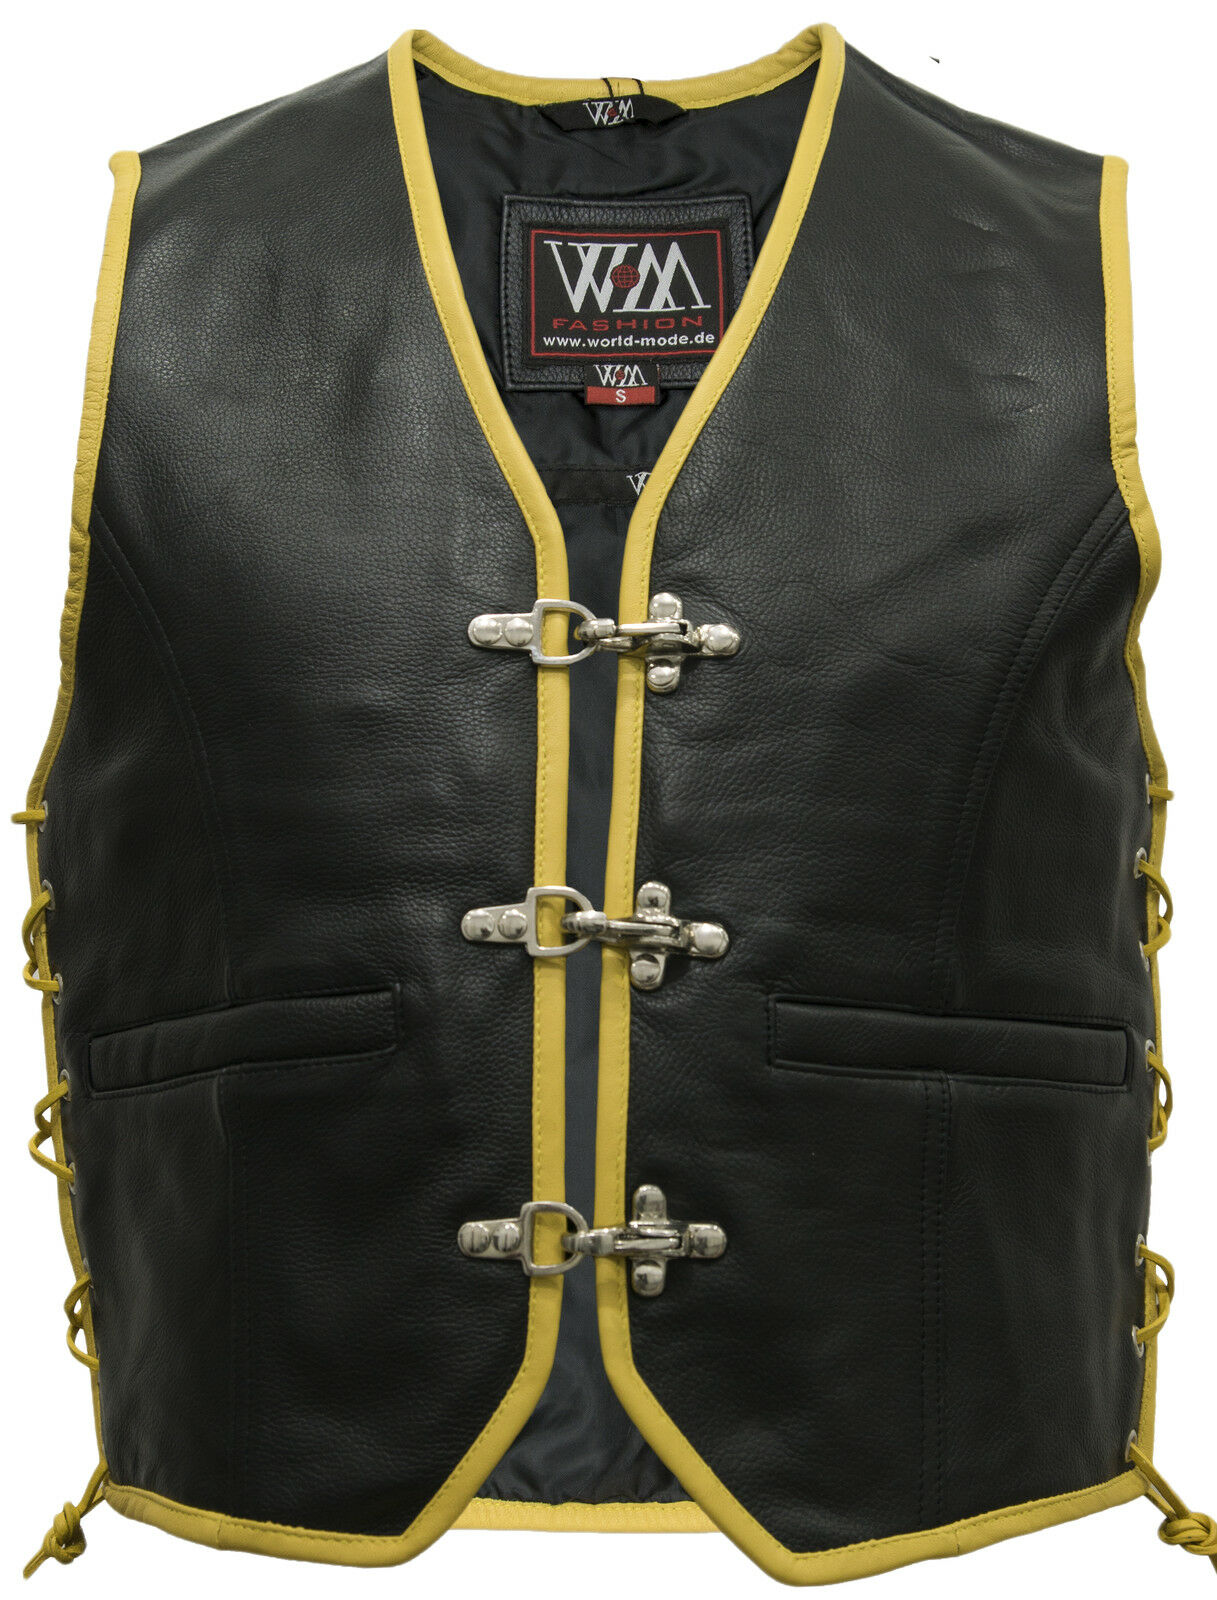 Lederweste Lederkutte Motorrad Clubweste Chopperweste Bikerweste Leather Vest